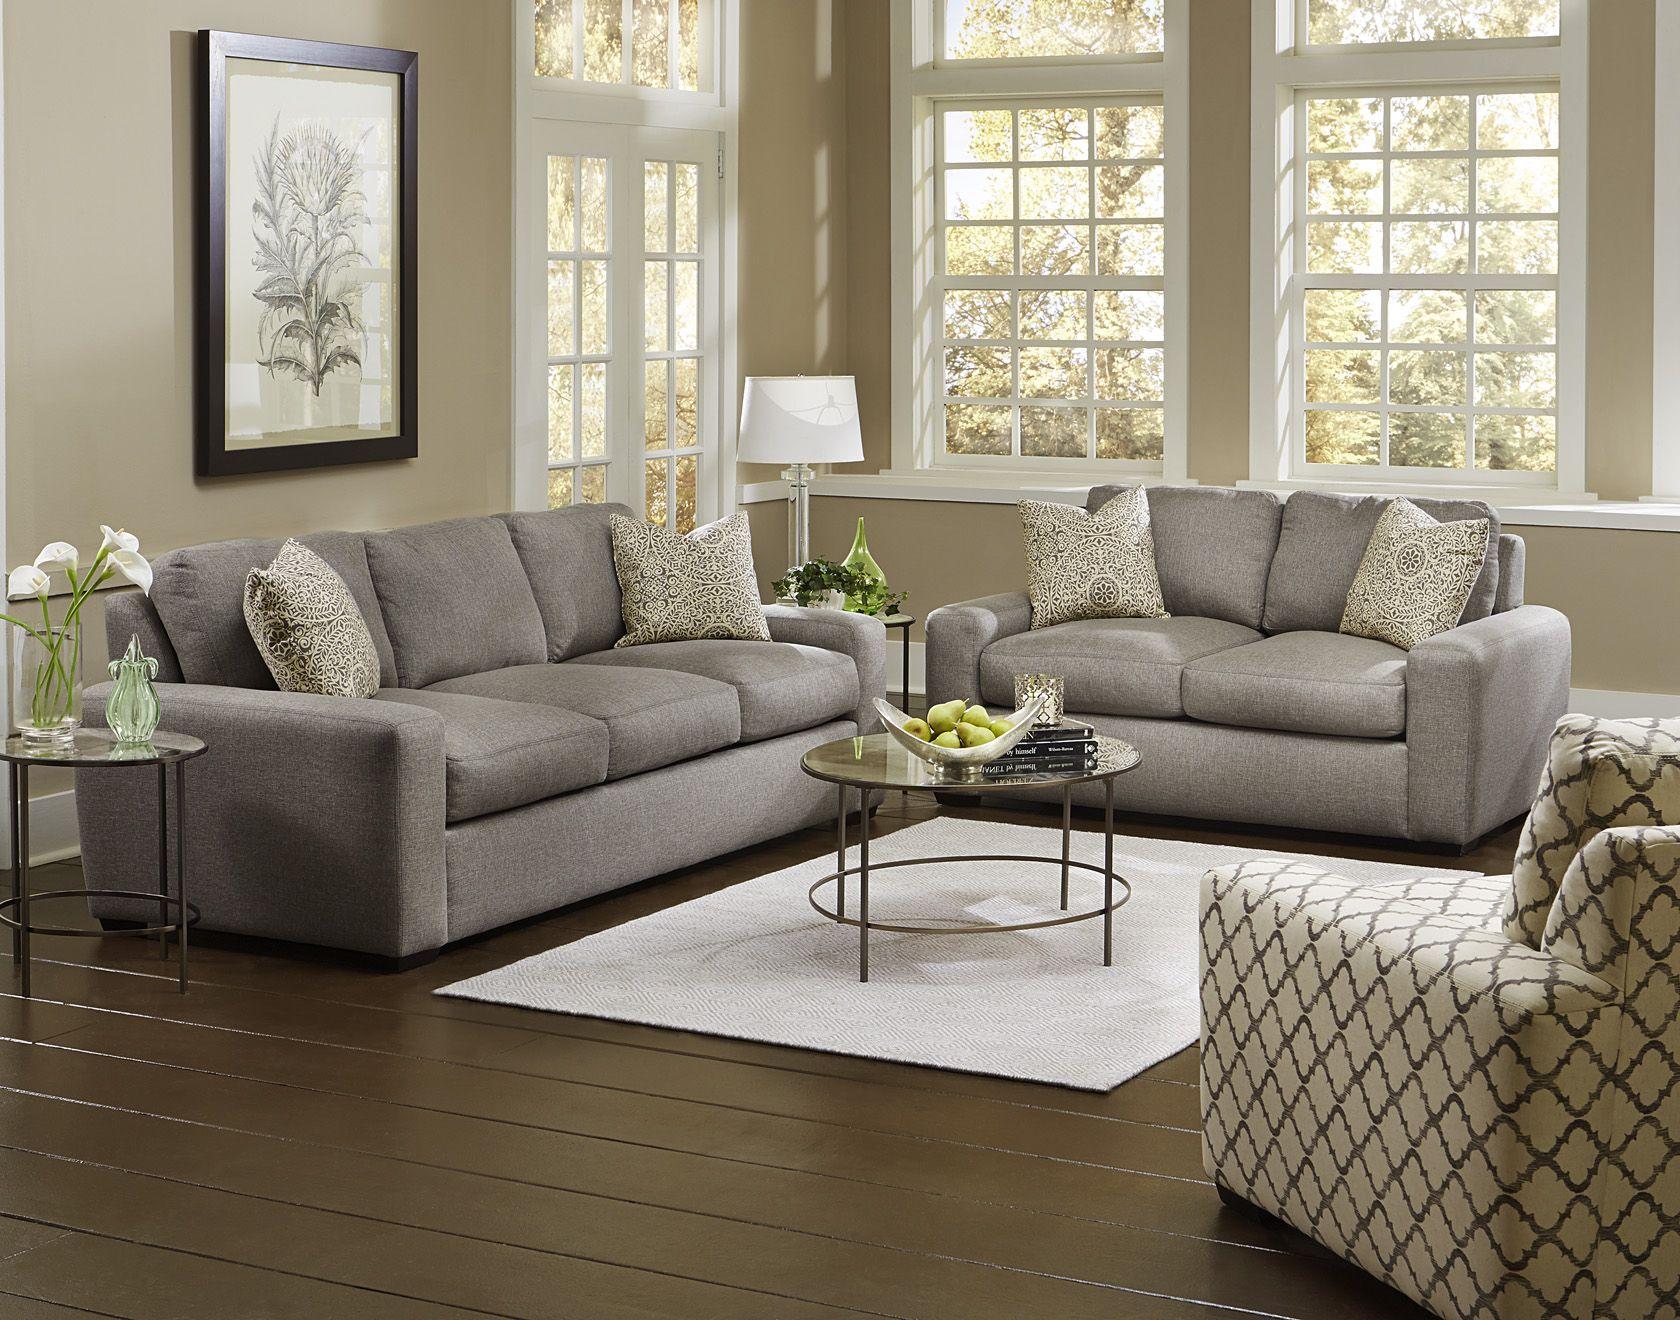 England Furniture 2t00 In Grande Pewter And Tachenda Greystone Fabrics Buy Home Furniture Furniture Modern Furniture Living Room